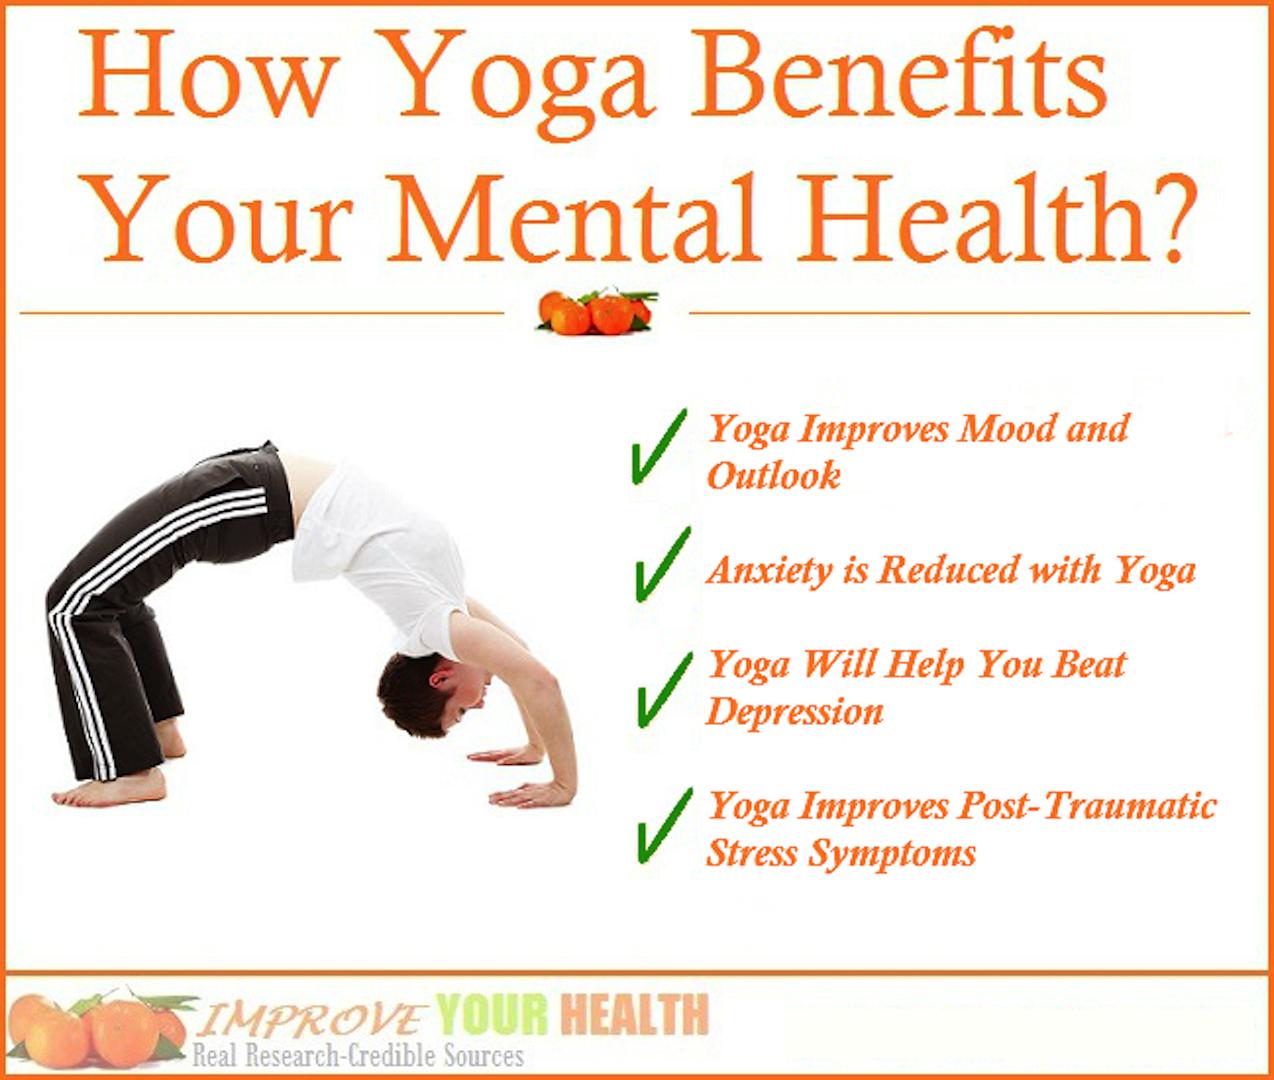 yoga-benefits-for-mental-health